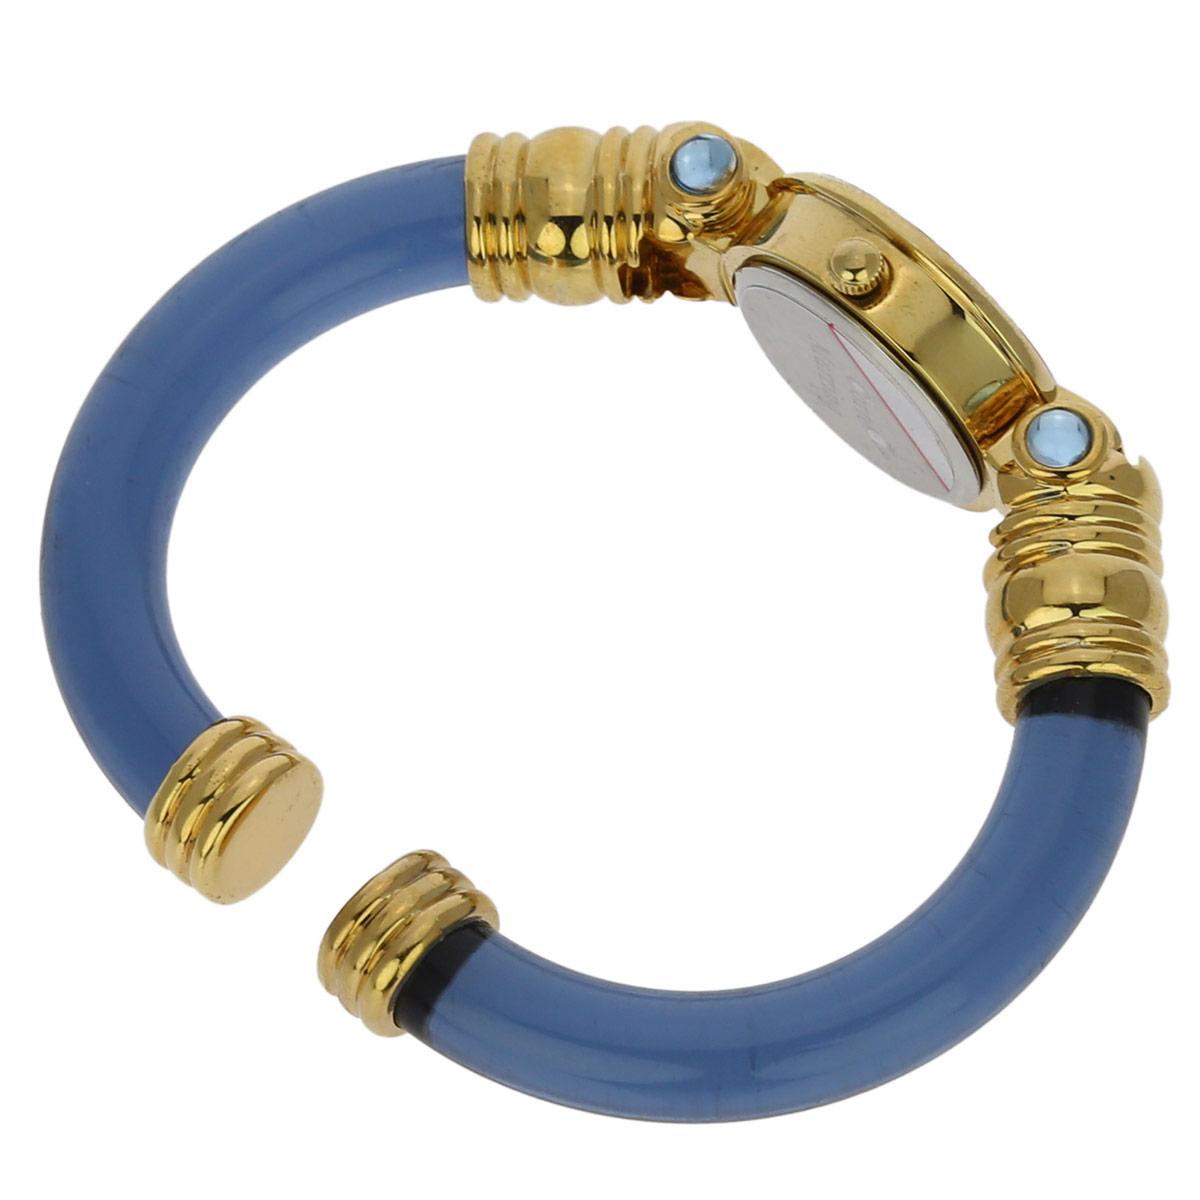 Murano Millefiori Bangle Watch - Light Blue